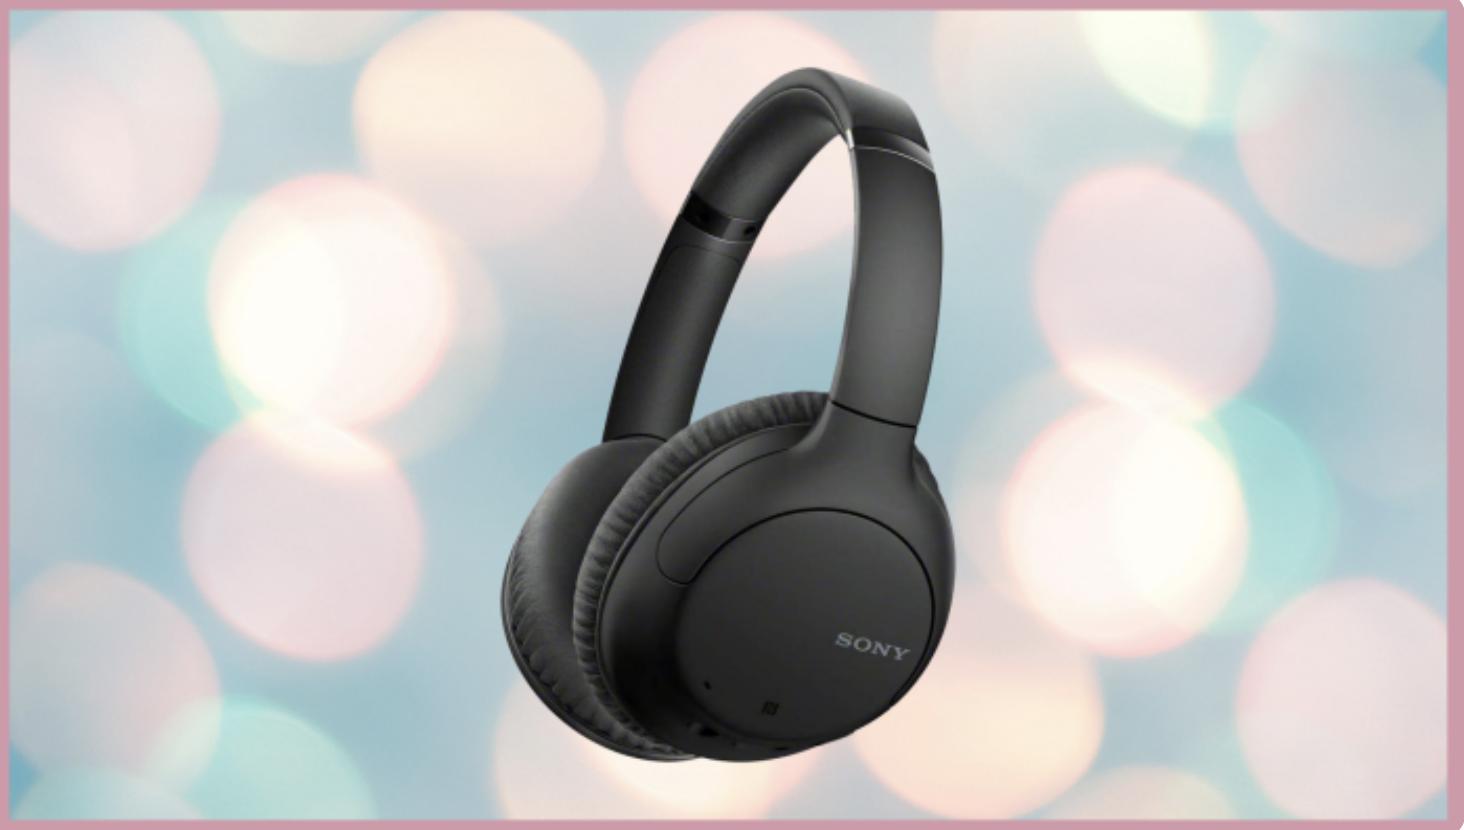 Prime Day: audífonos inalámbricos 'top' a unos precios difíciles de encontrar